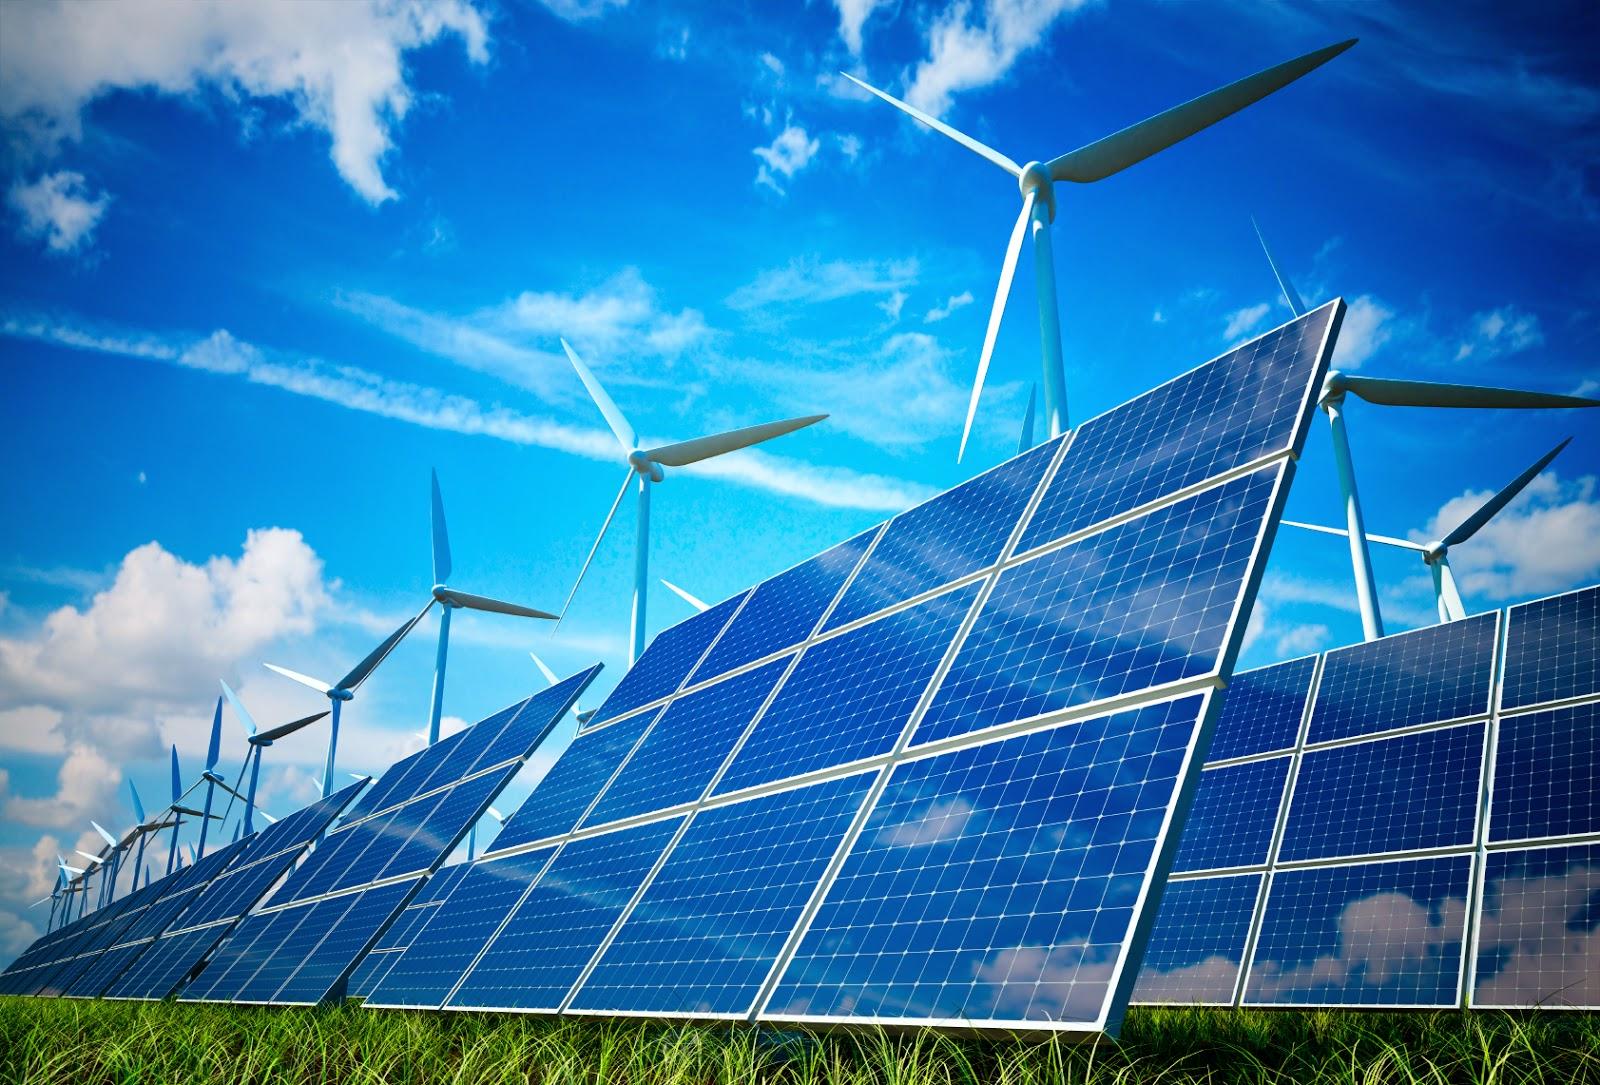 Macam Macam Energi Alternatif Pokja Energi Manega